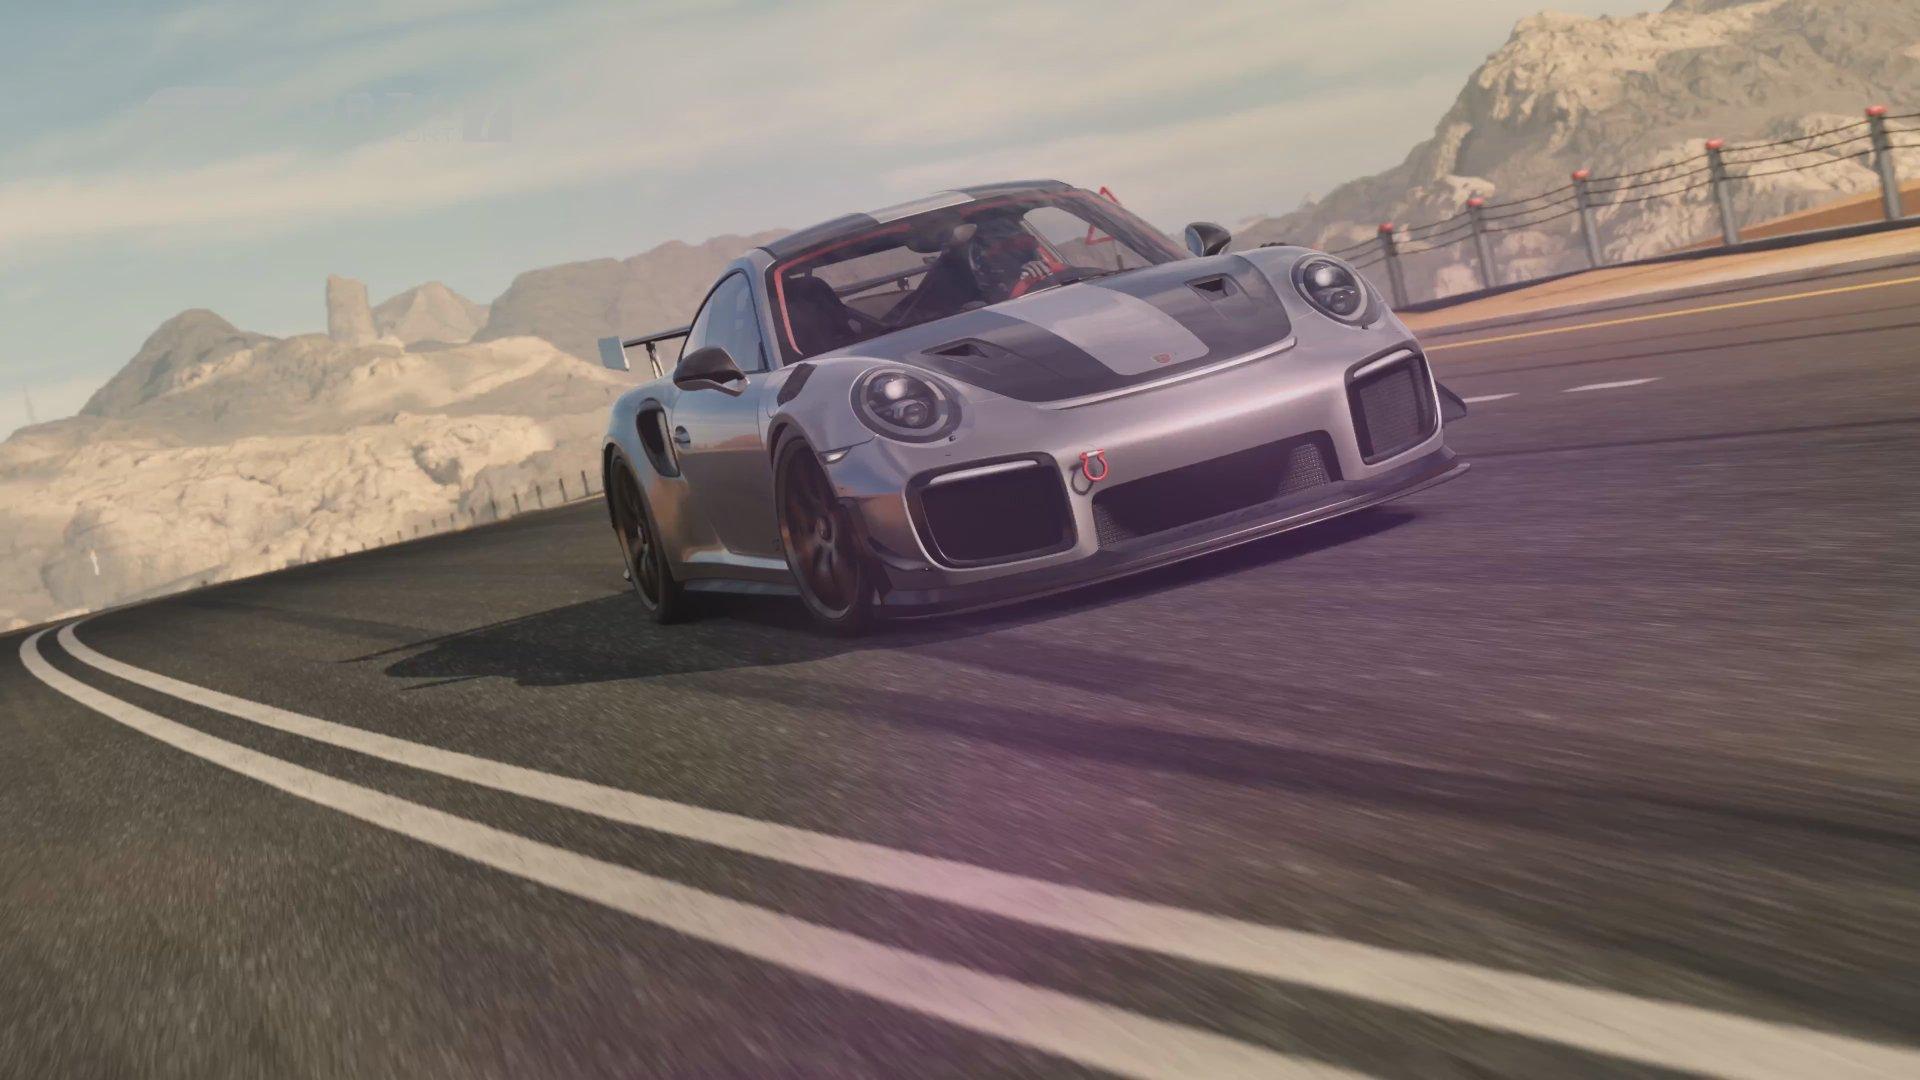 Forza Motorsport 7 Wallpapers Ultra Hd Gaming Backgrounds: Download Forza Motorsport 7 HD Wallpapers